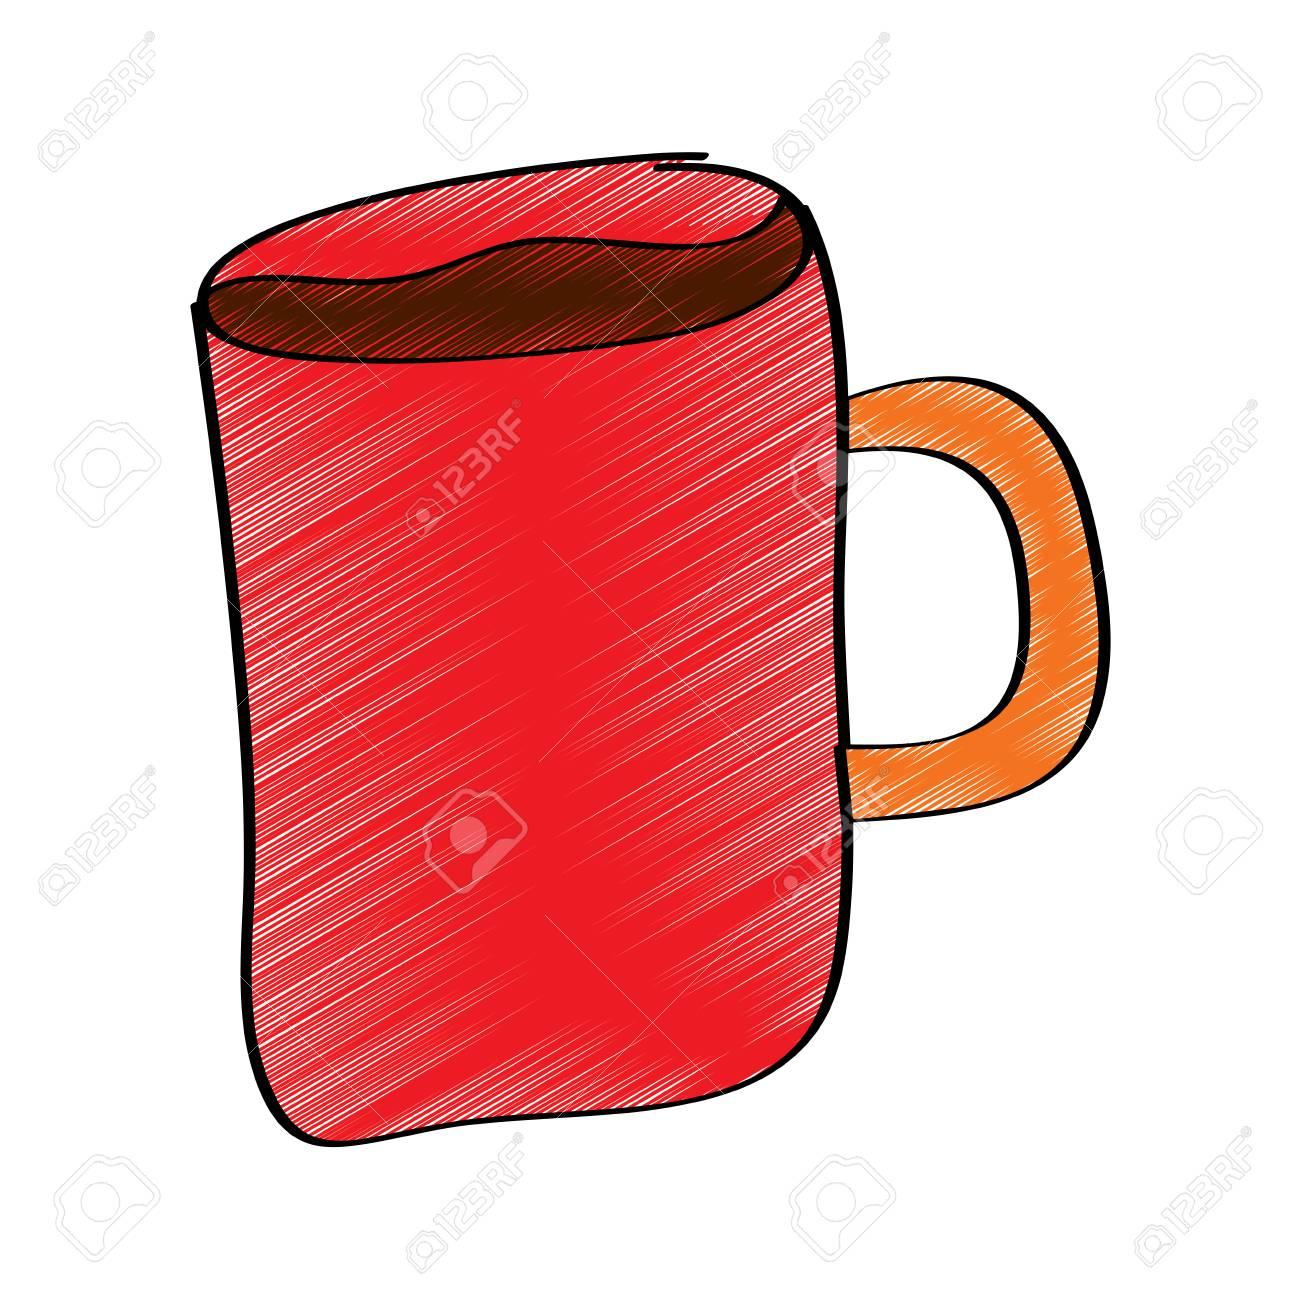 Cartoon Coffee Mug Drink Beverage Vector Illustration Drawing Royalty Free Cliparts Vectors And Stock Illustration Image 96072199